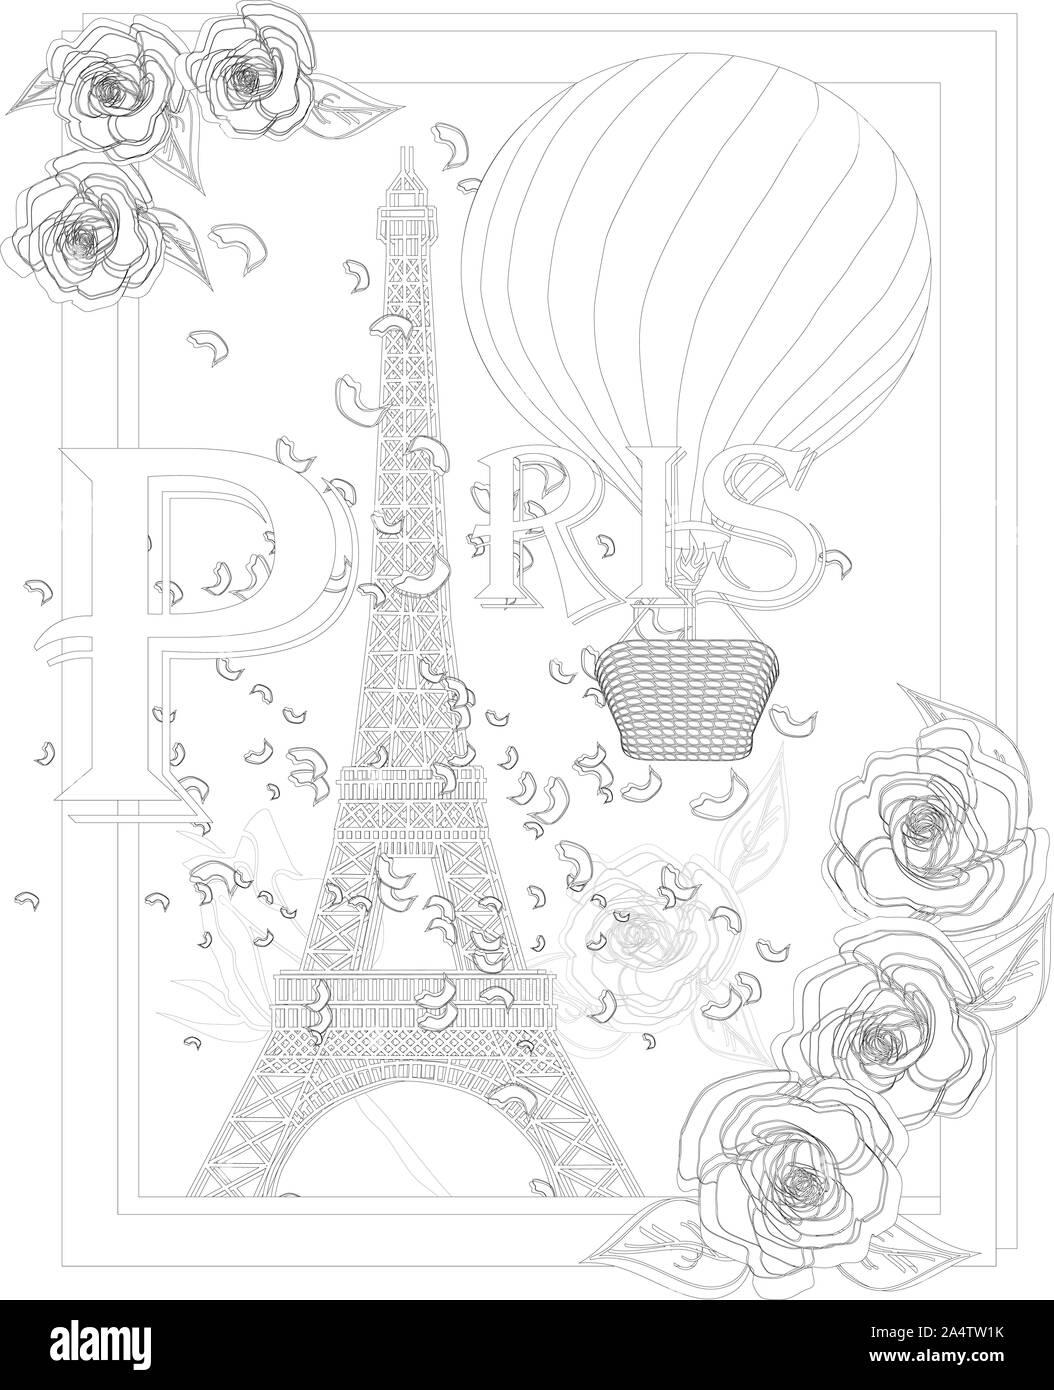 Tatuaje De La Torre Eiffel Imágenes De Stock Tatuaje De La